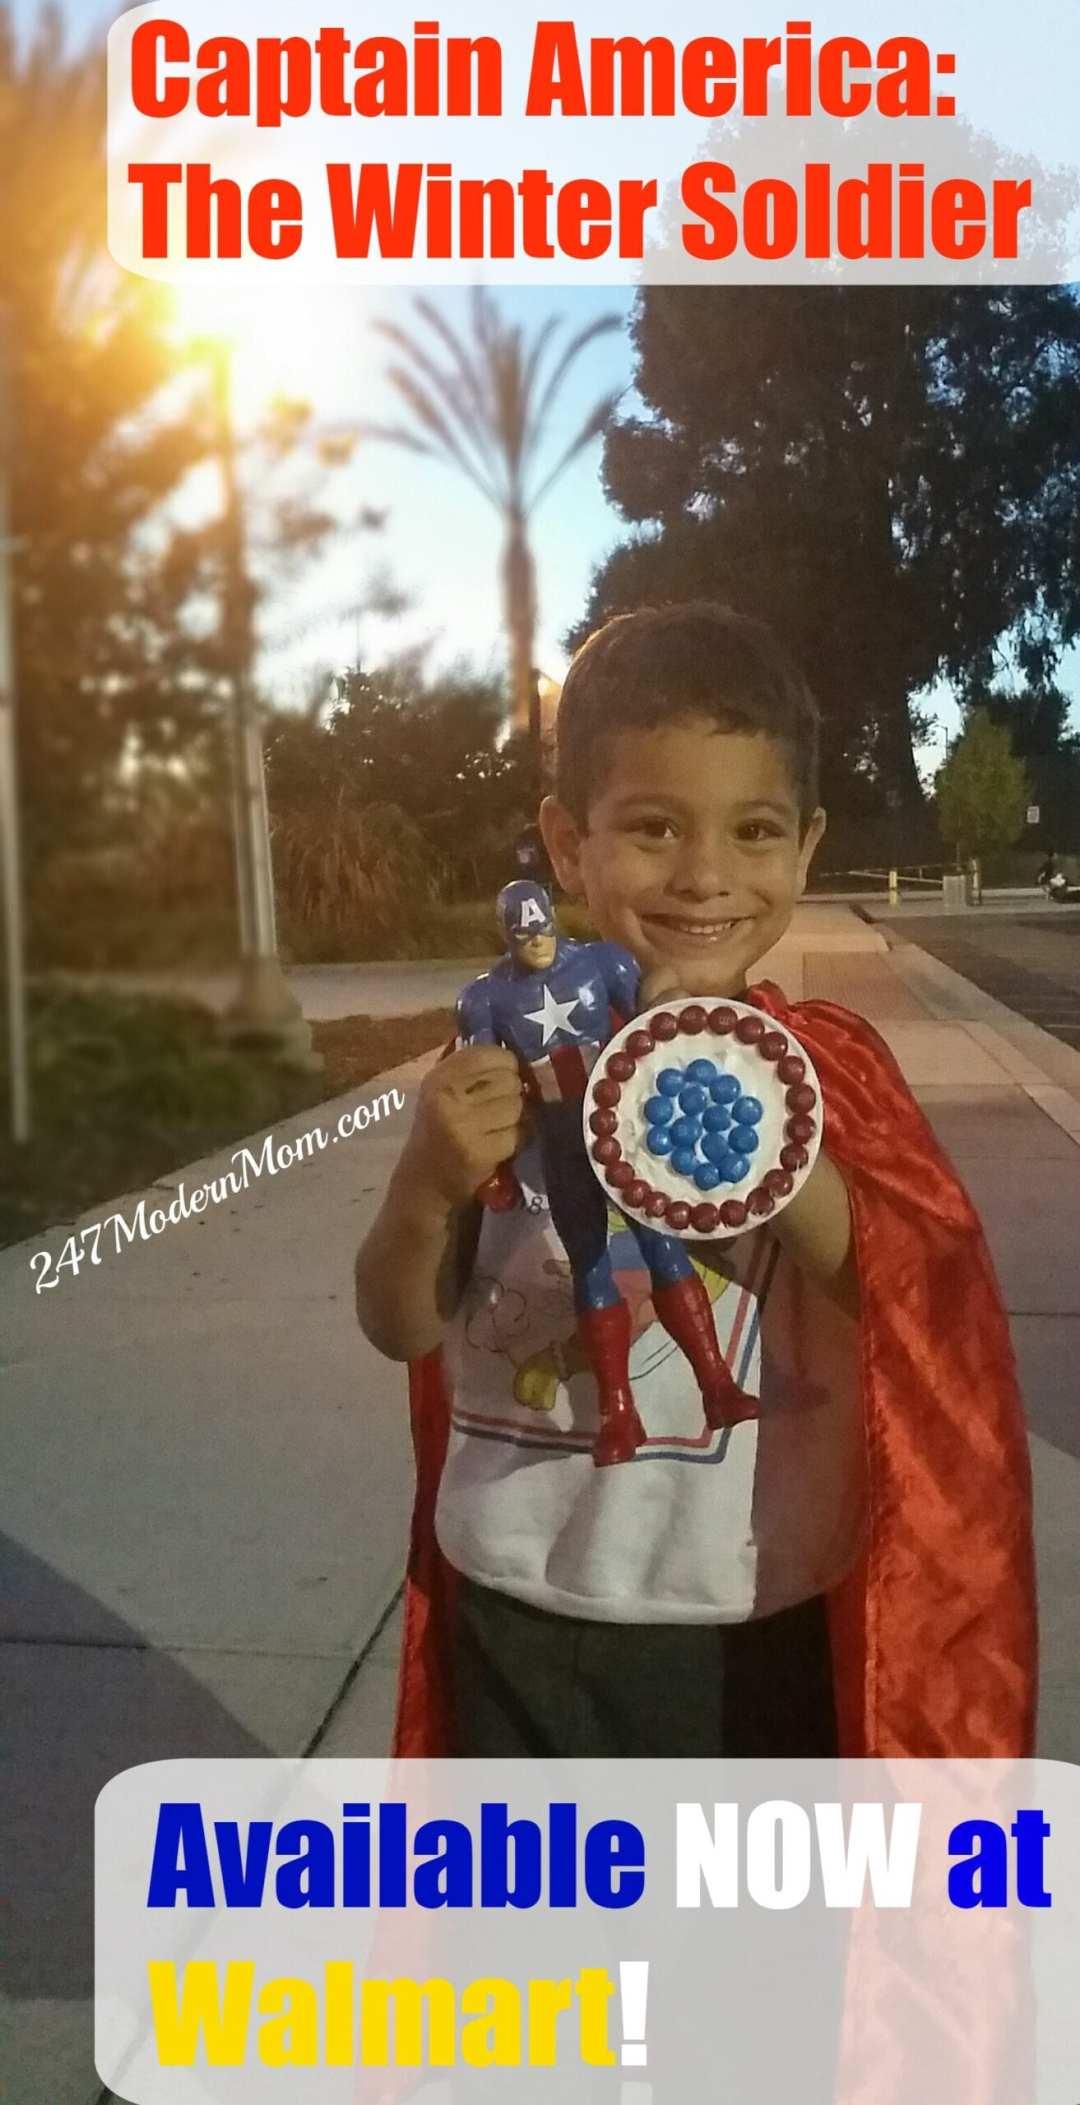 #HeroesEatMMs #Shop #CollectiveBias Captain America